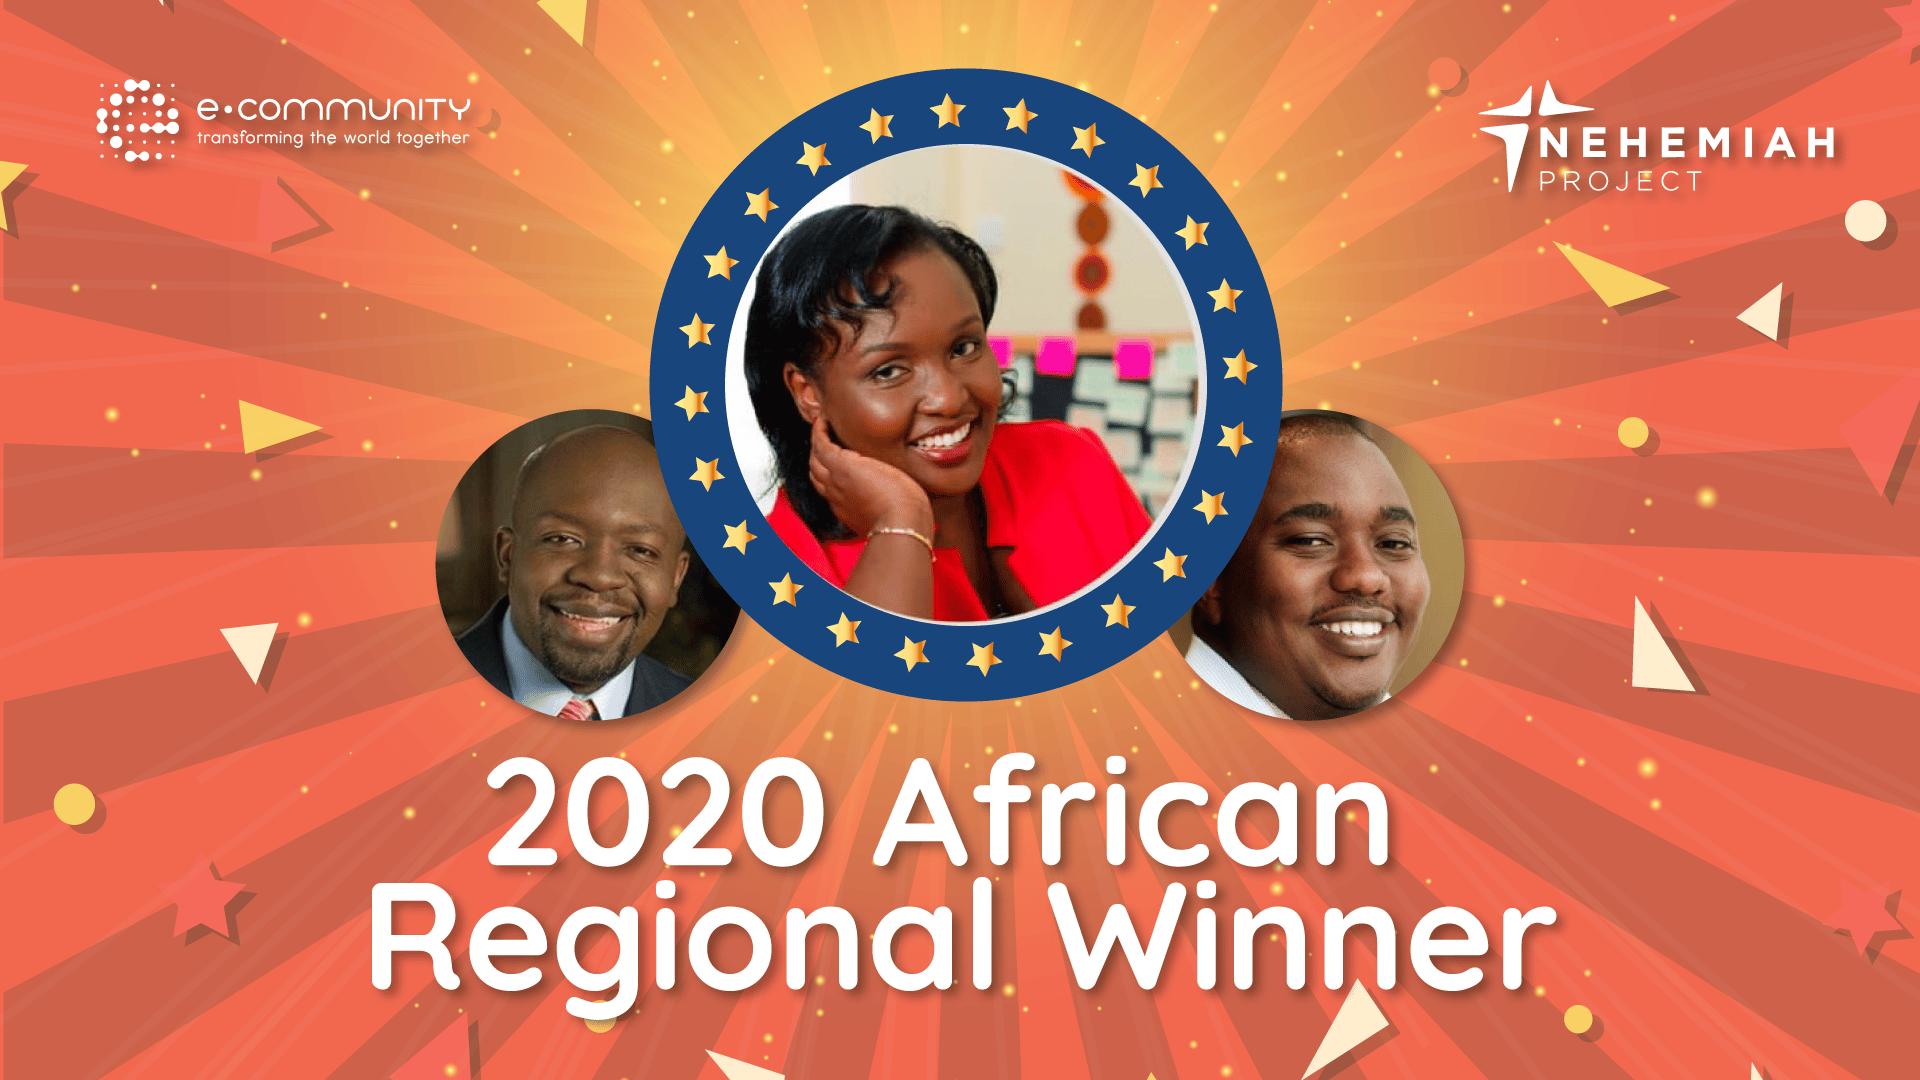 2020 Africa Regional Winner